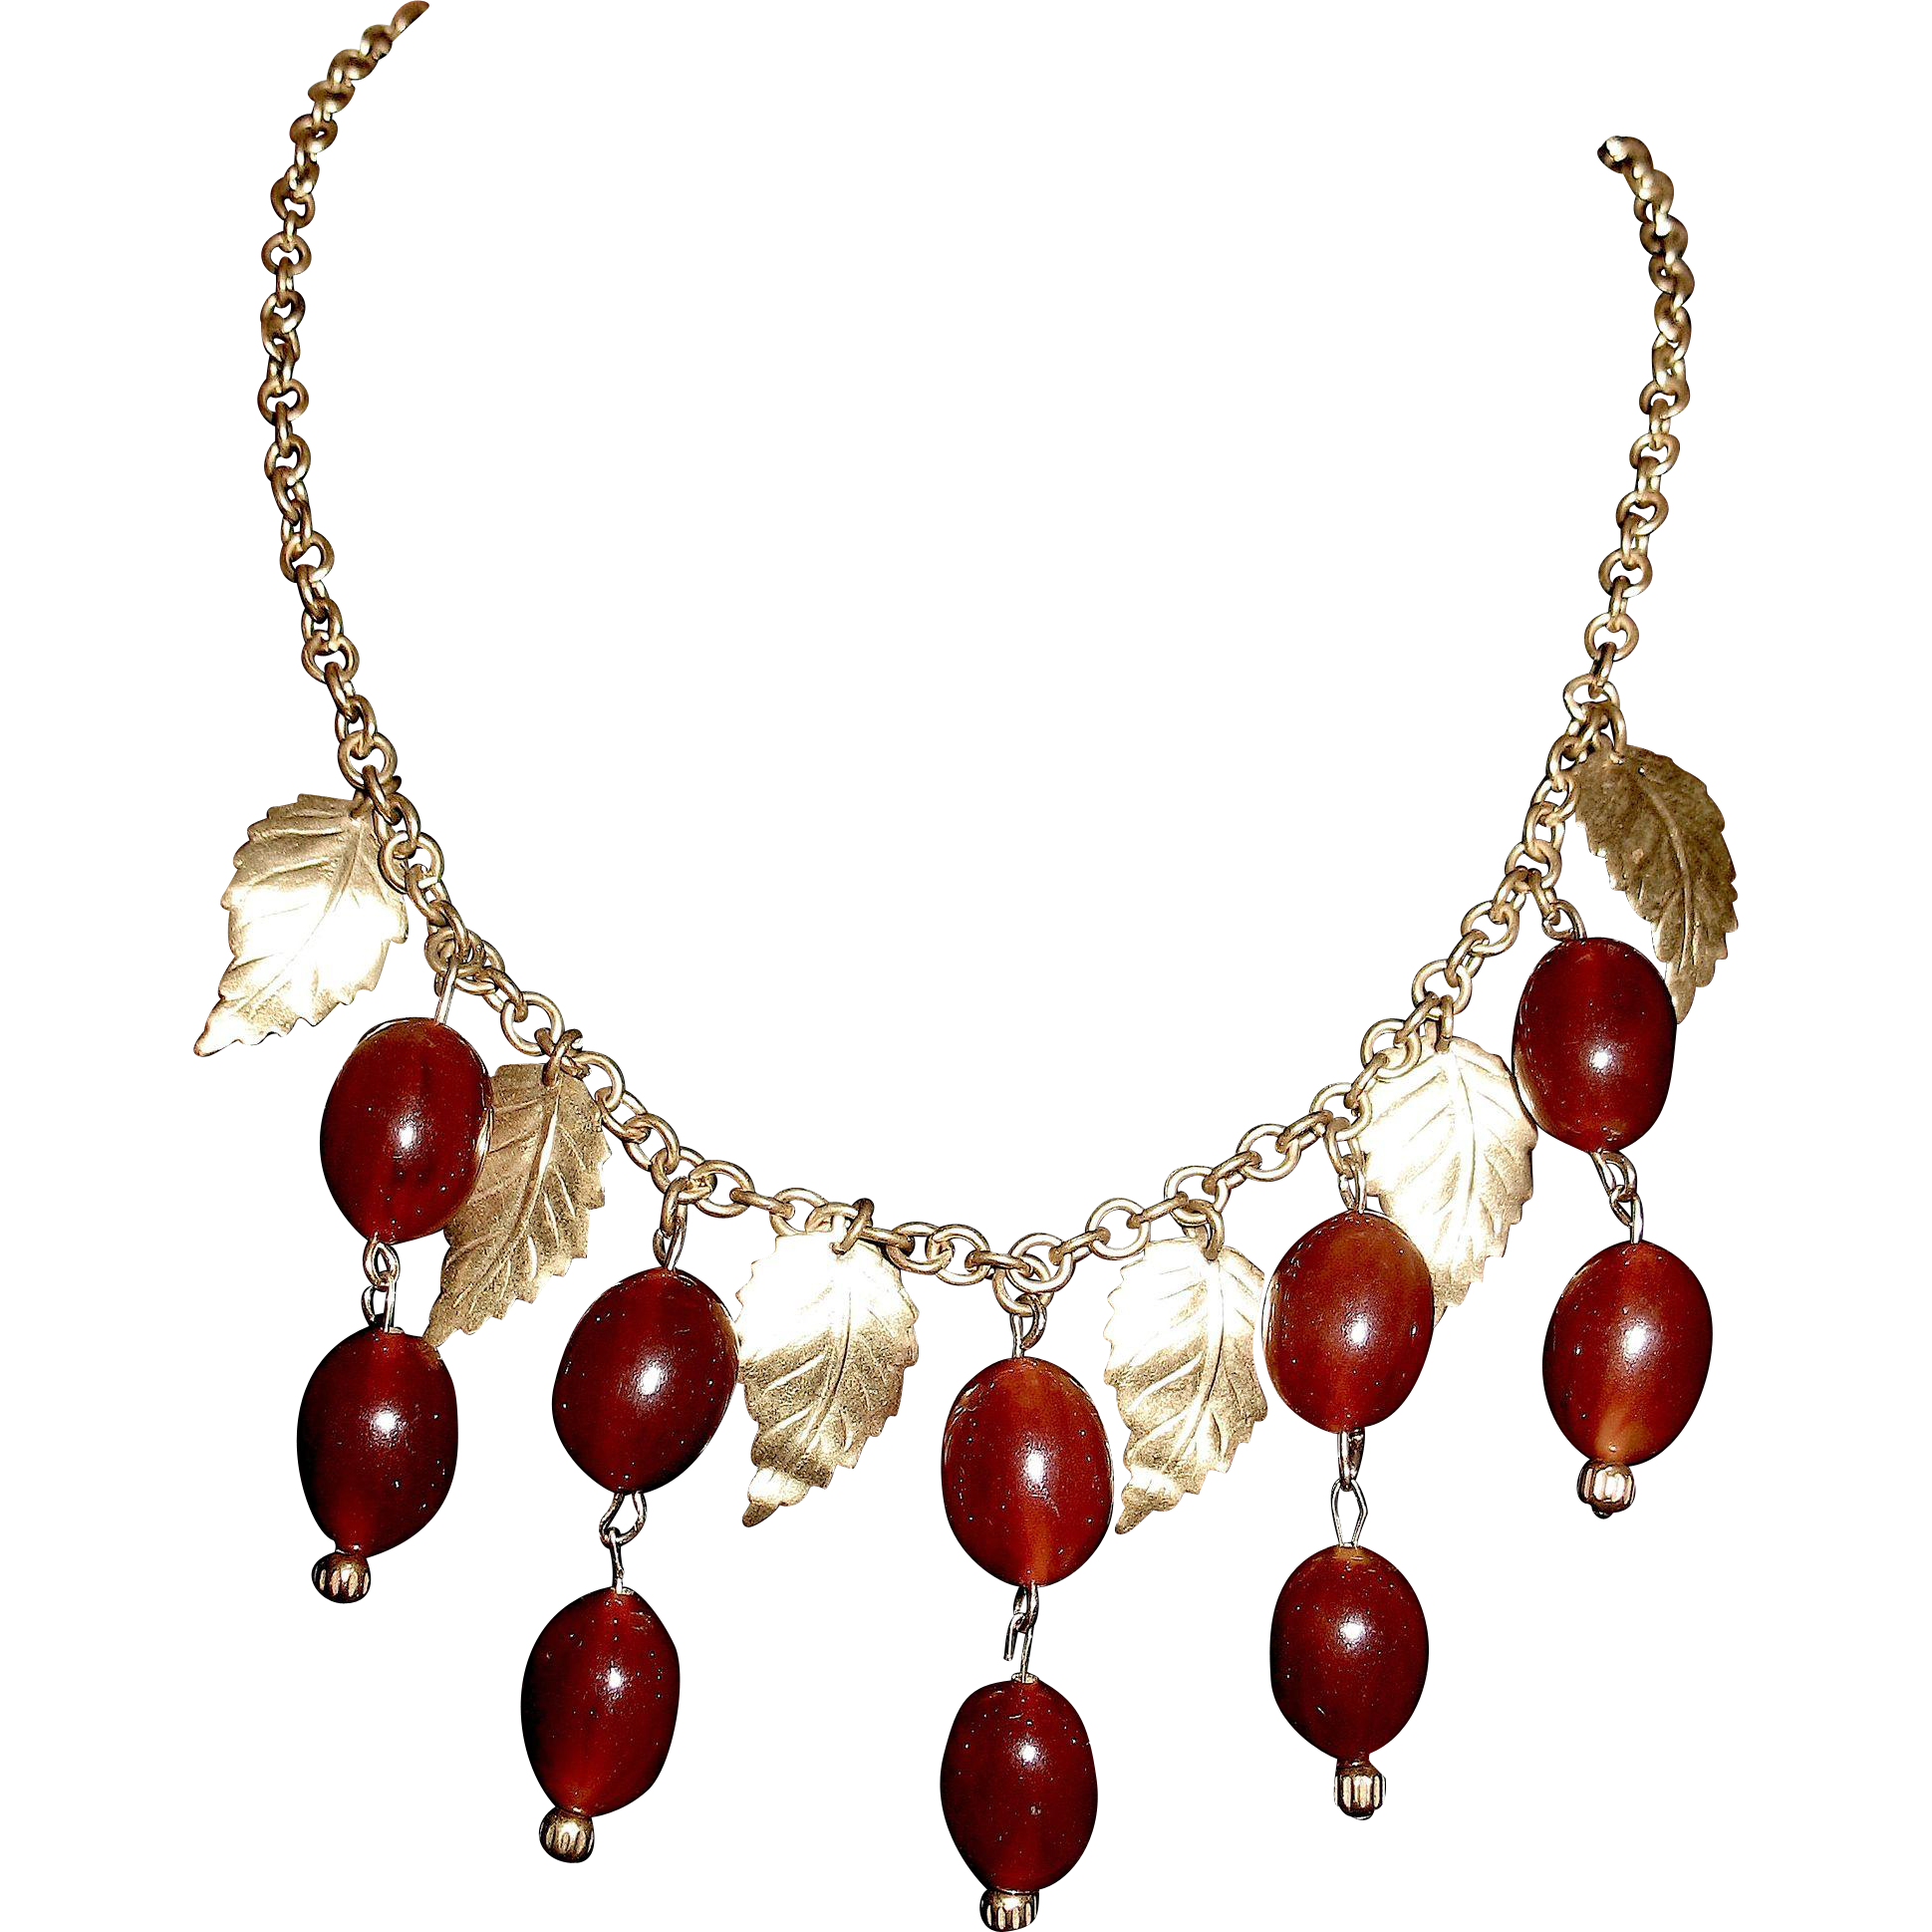 Gorgeous Vintage Bakelite Bib Necklace w Bakelite Acorns and Brass Leaves